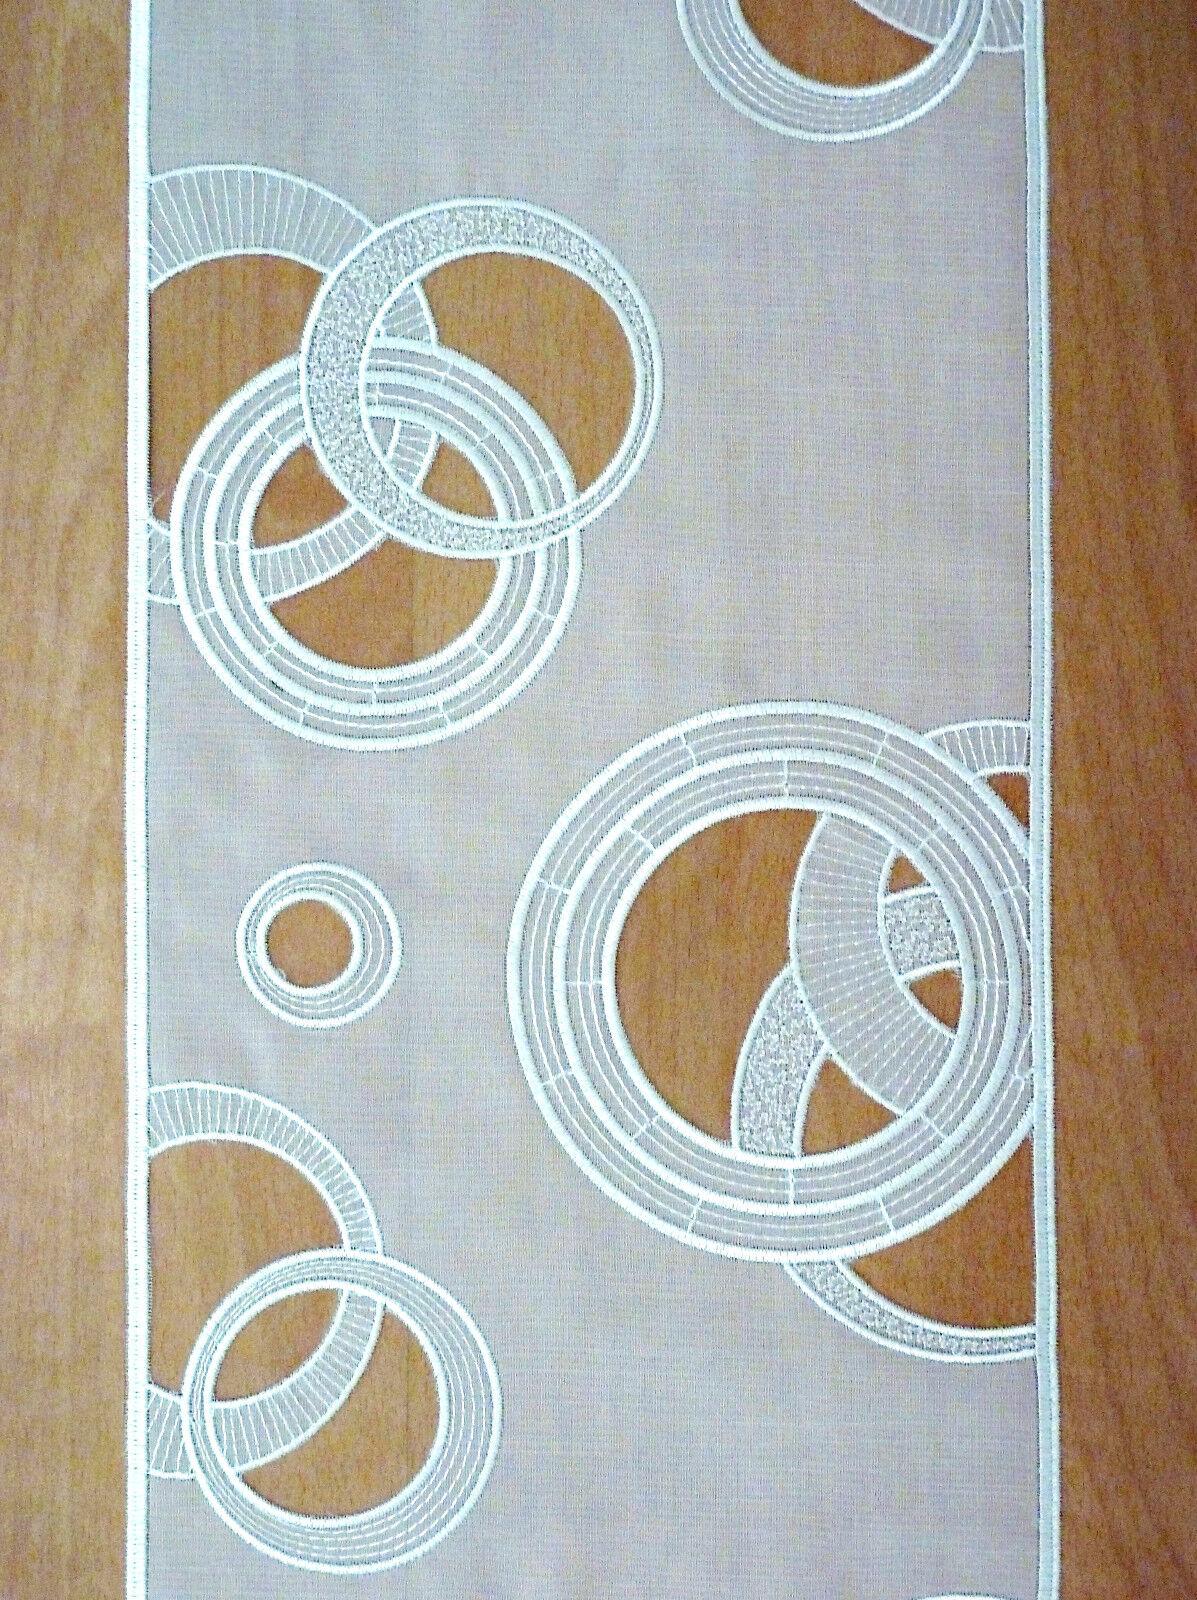 Fl chenvorhang schiebevorhang gardine paneel kreise ringe welle 40 cm 60 cm eur 46 00 - Gardine kreise ...